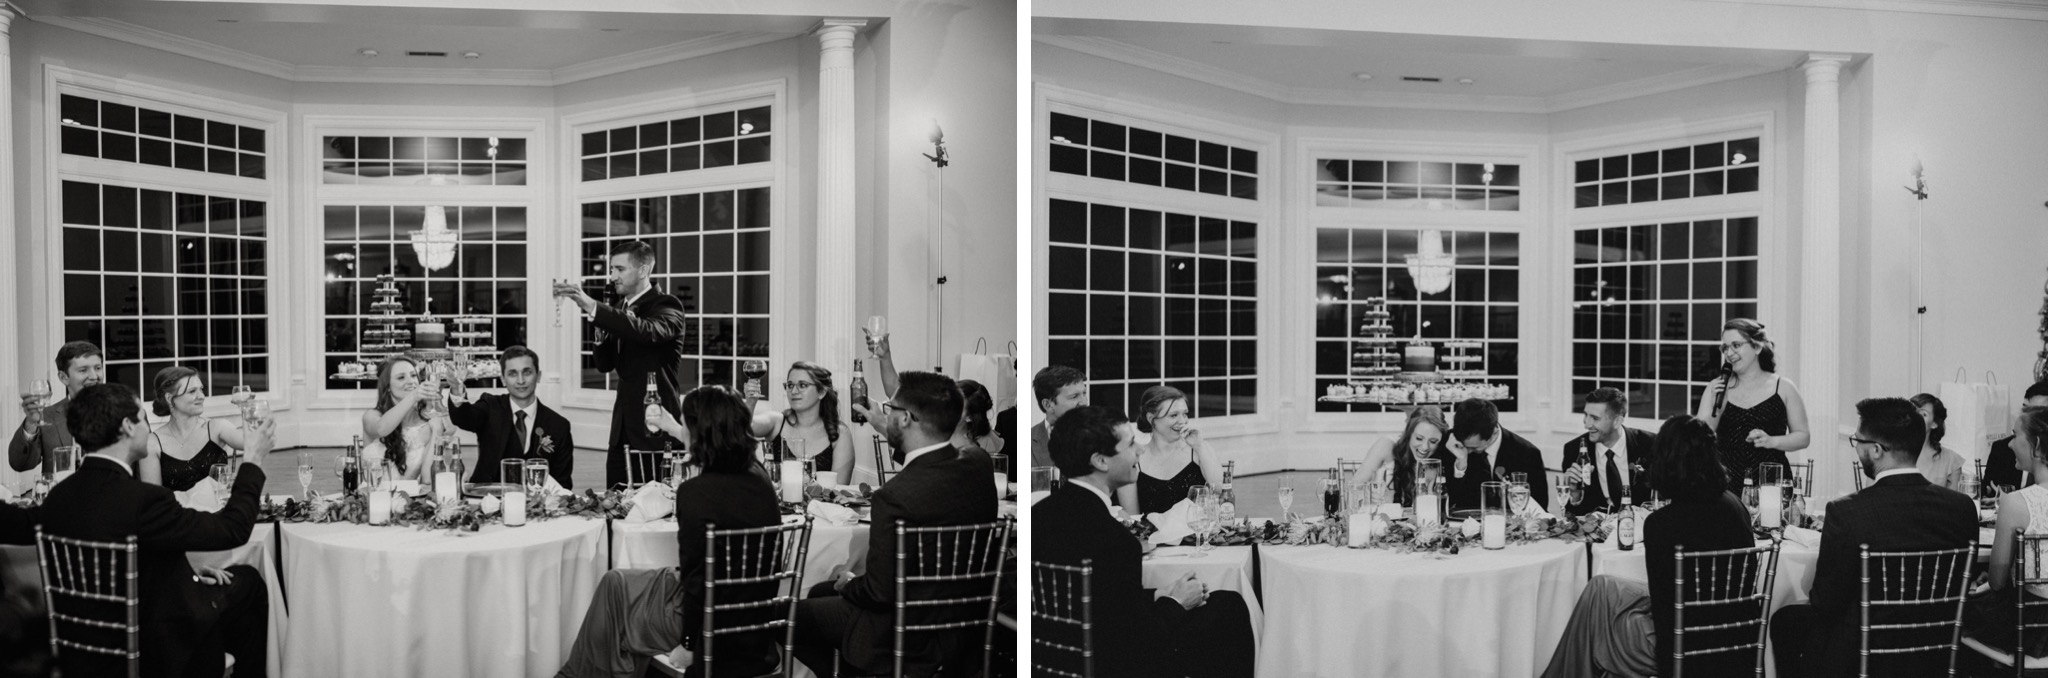 83_West Manor Estate Weddings - Pat Cori Photography-183_West Manor Estate Weddings - Pat Cori Photography-185_VirginiaWeddingPhotographer_toasts_WestManorEstate_Weddingvenue_Wedding.jpg